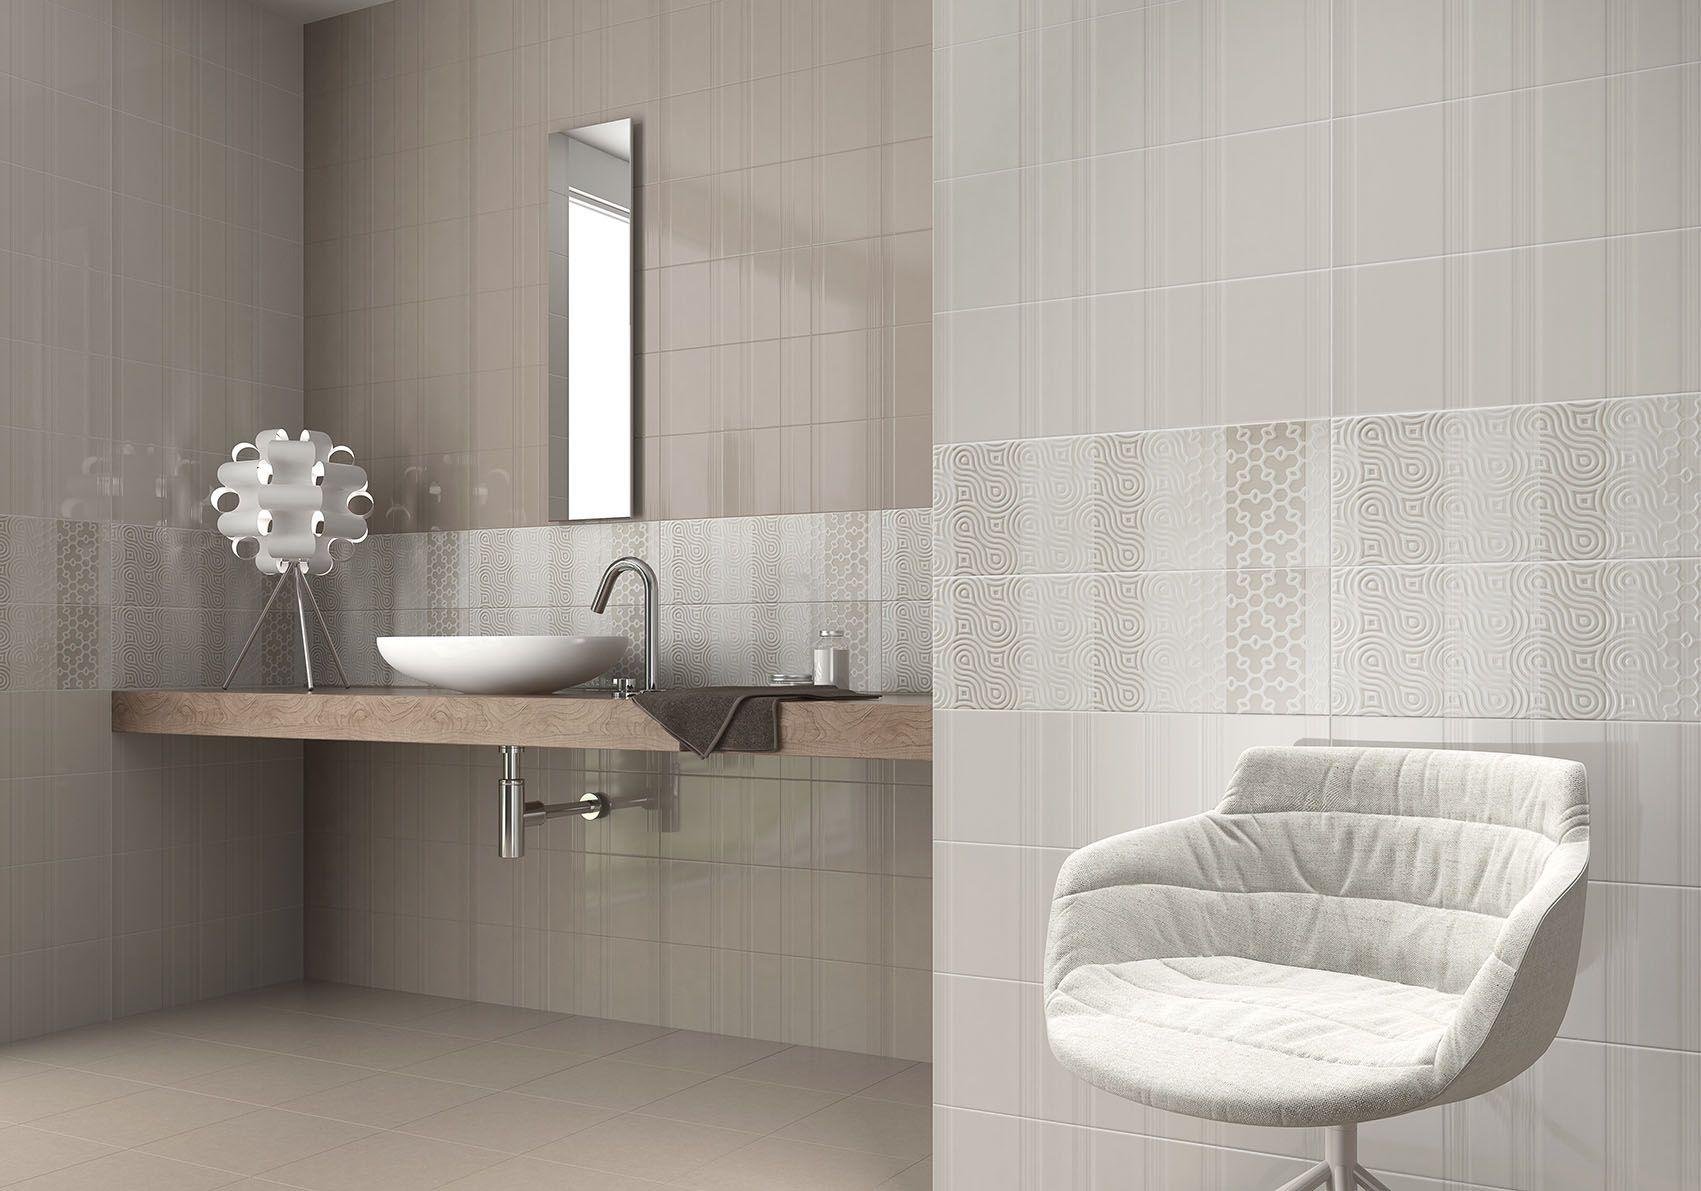 Win 20x60 - Red body wall #tiles | Bathroom- Baño | Pinterest | Red ...